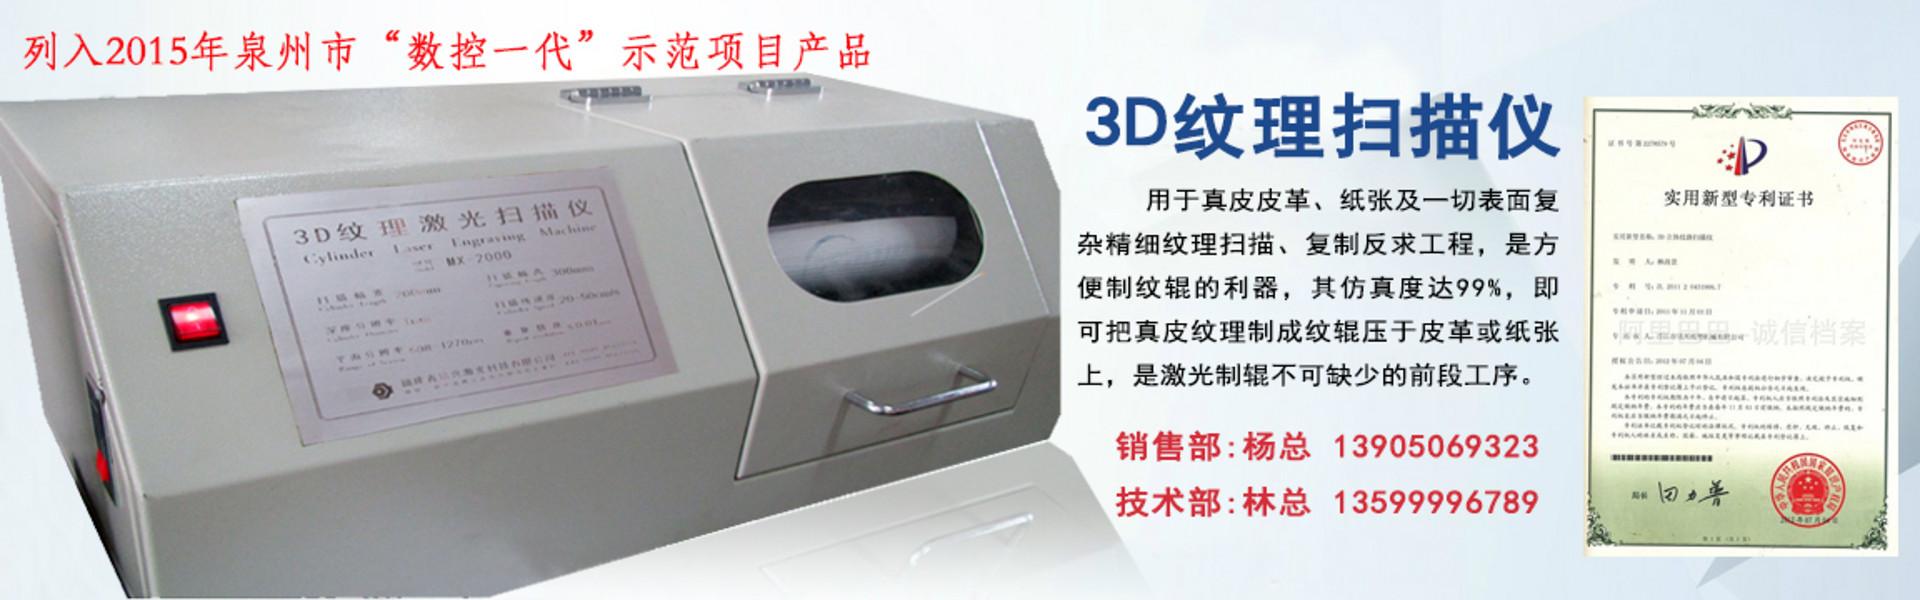 3D激光掃描儀訂購_銘興激光科技提供專業3D紋理掃描儀